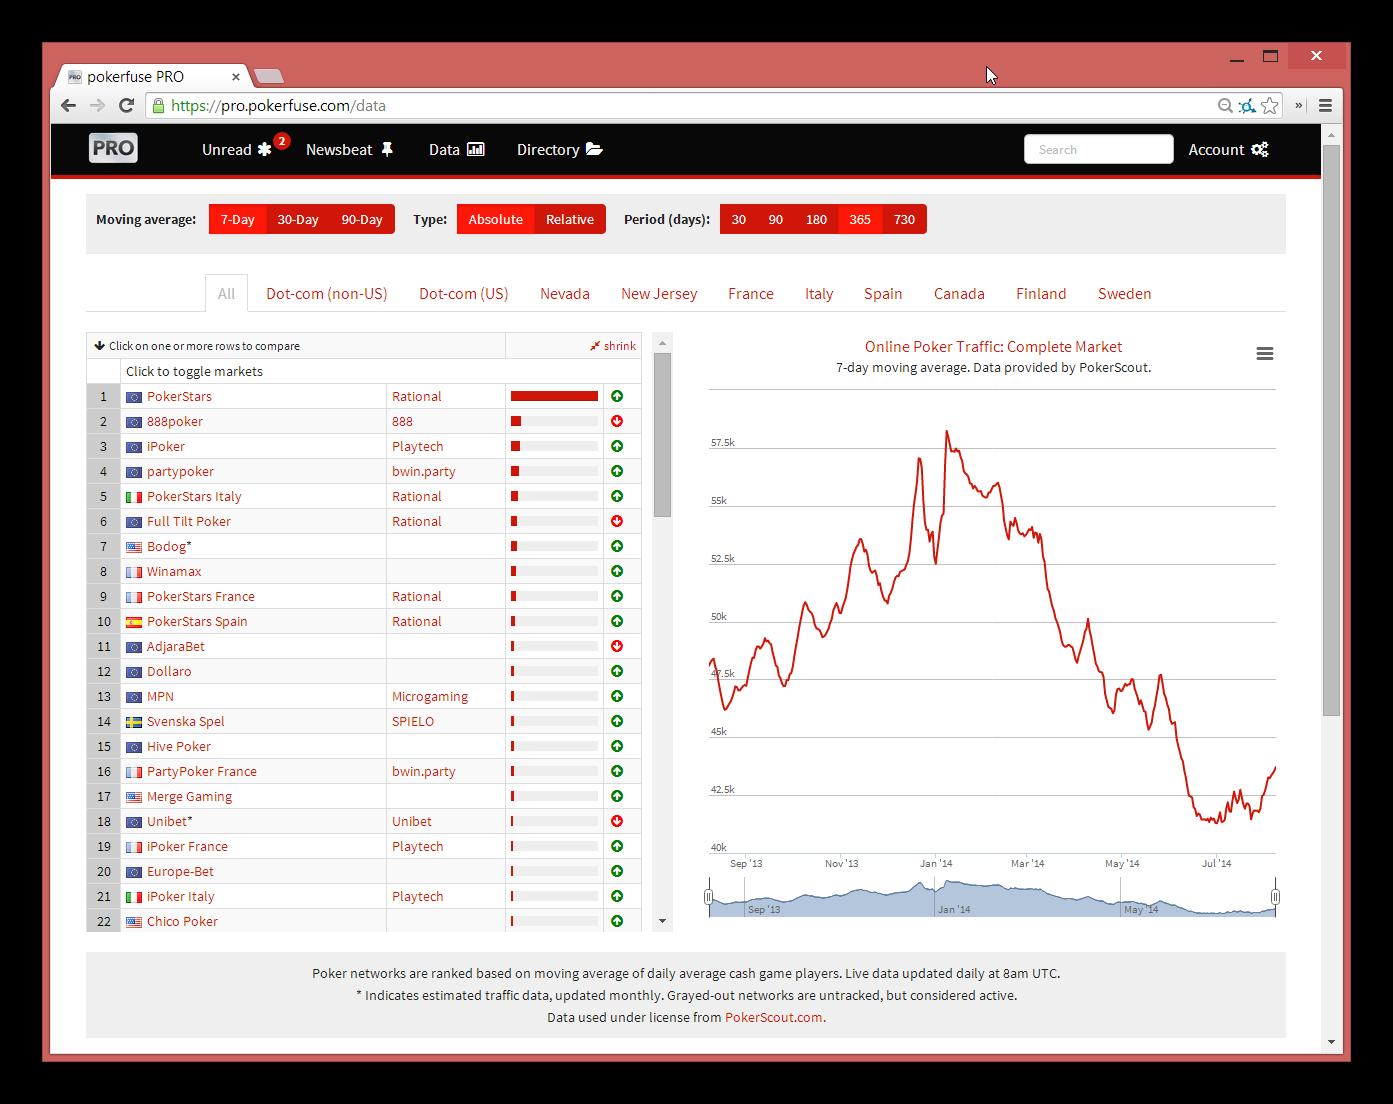 Poker website traffic